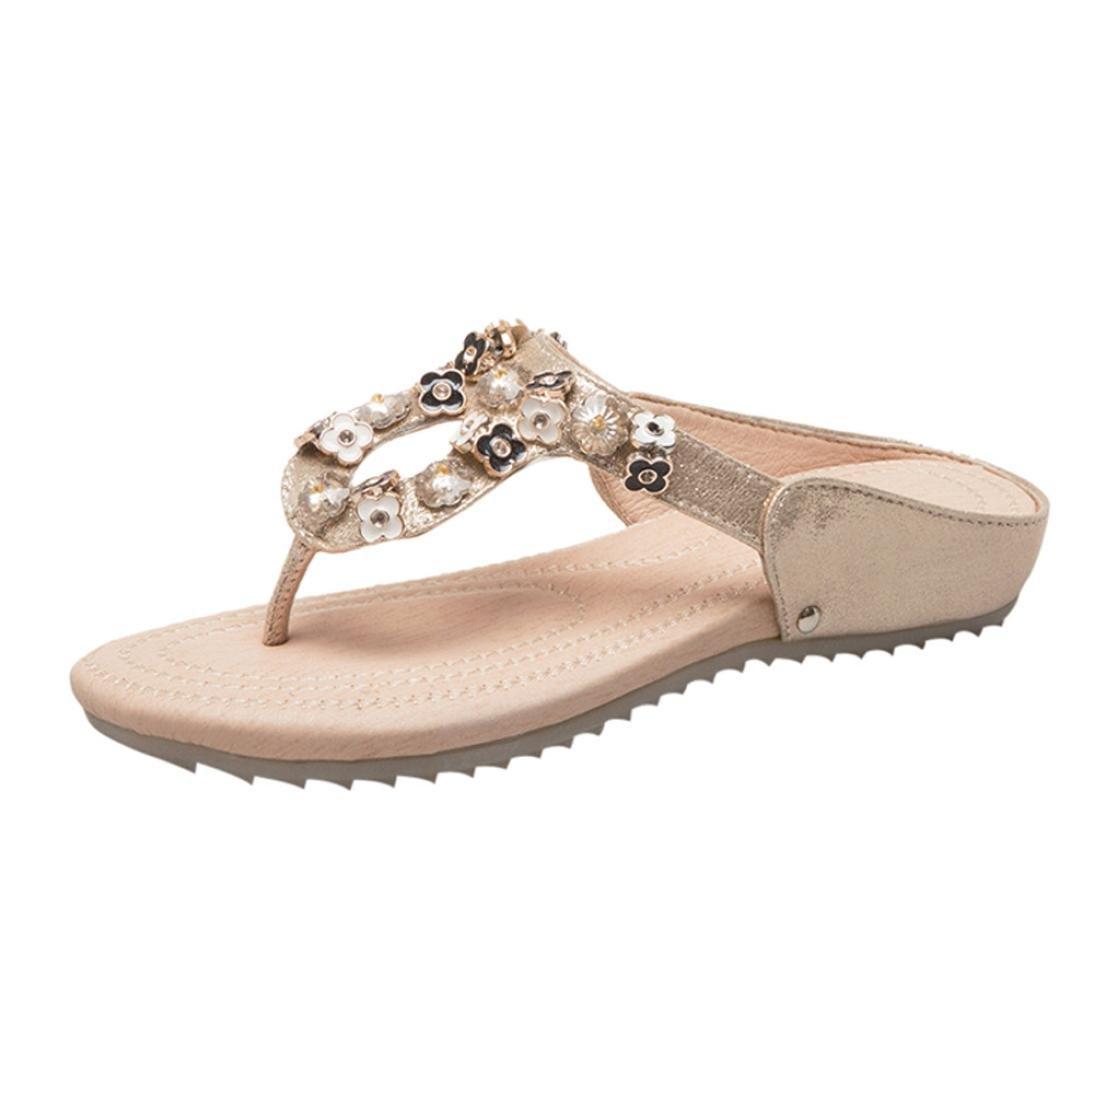 Women Sandals Women Summer Bohemia Flip Flop Shoes Flower Rhinestone Flats Elegant Beach Shoes